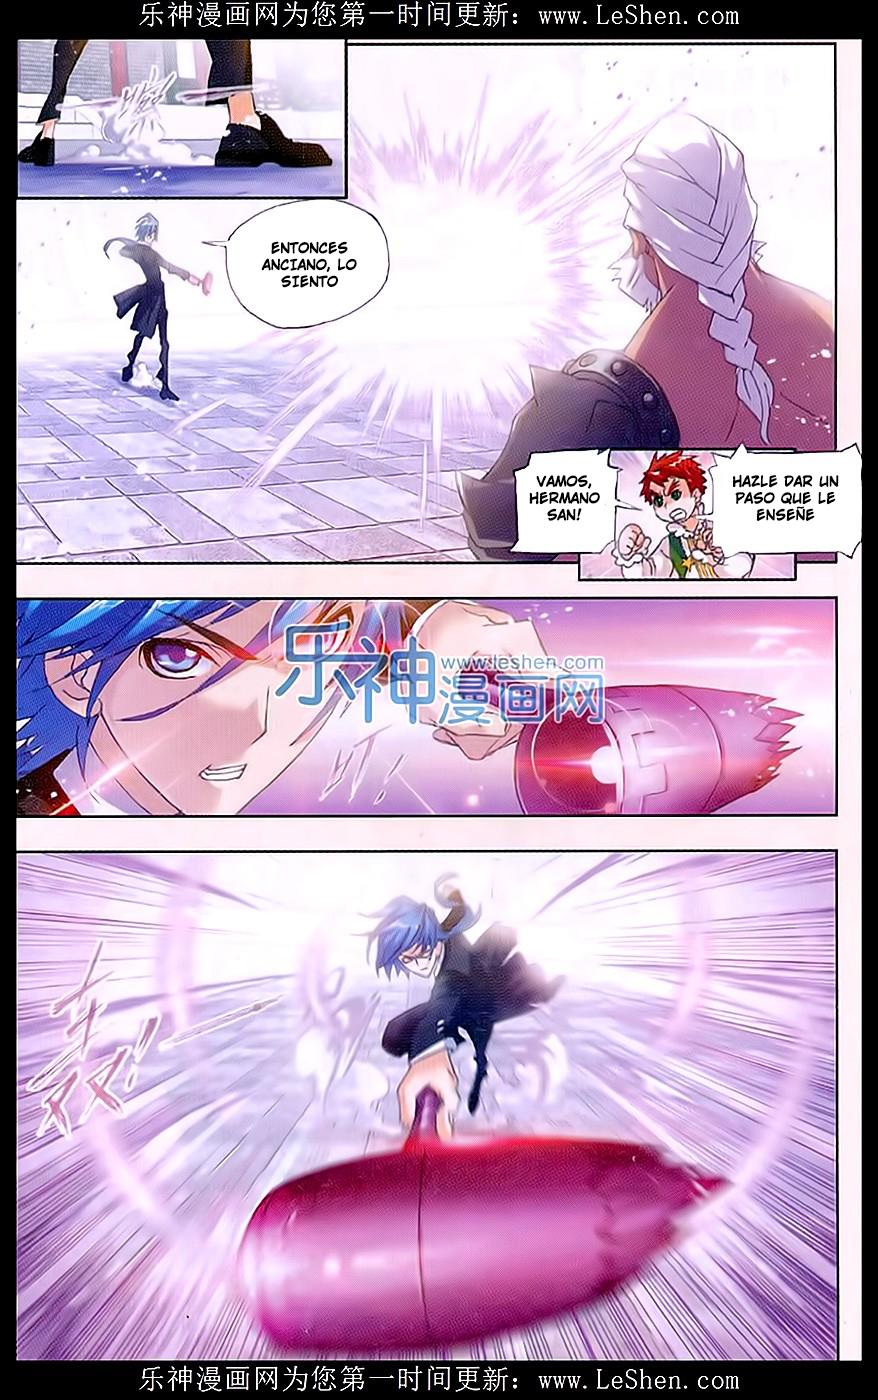 http://c5.ninemanga.com/es_manga/18/16210/450287/55f2cad795eba35becb202877f4f7616.jpg Page 6